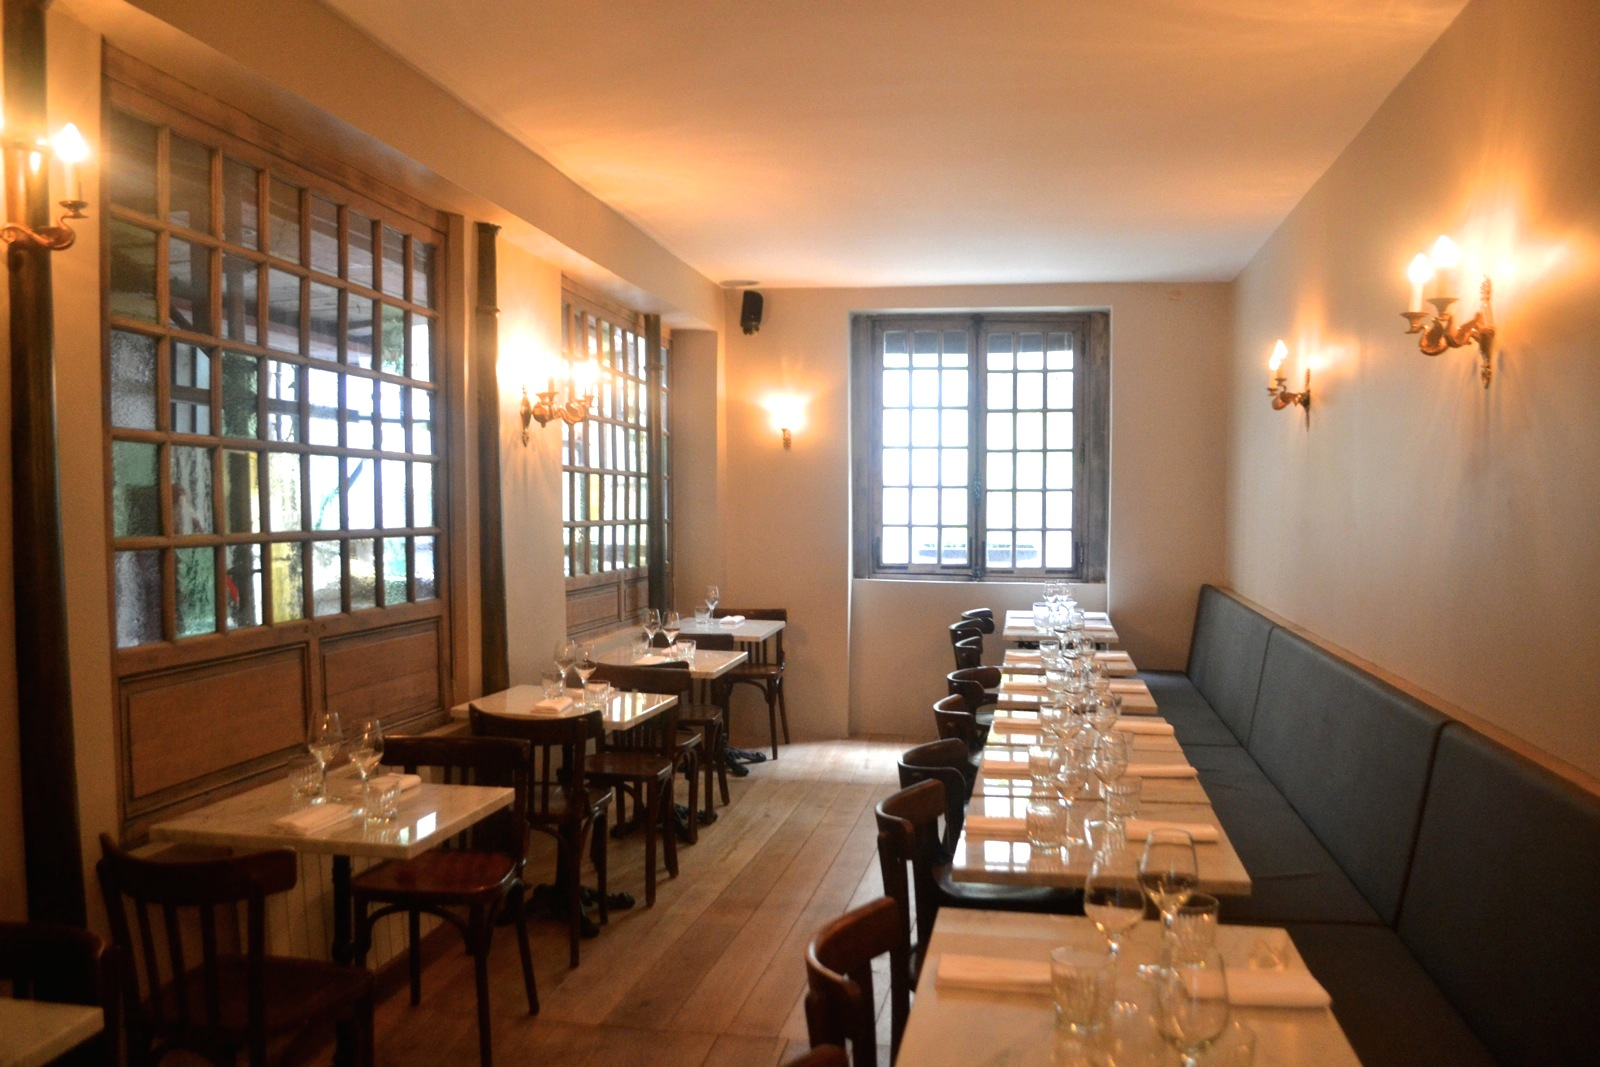 Ellsworth Restaurant And Wine Bar Revisiting American Comfort Food In Paris